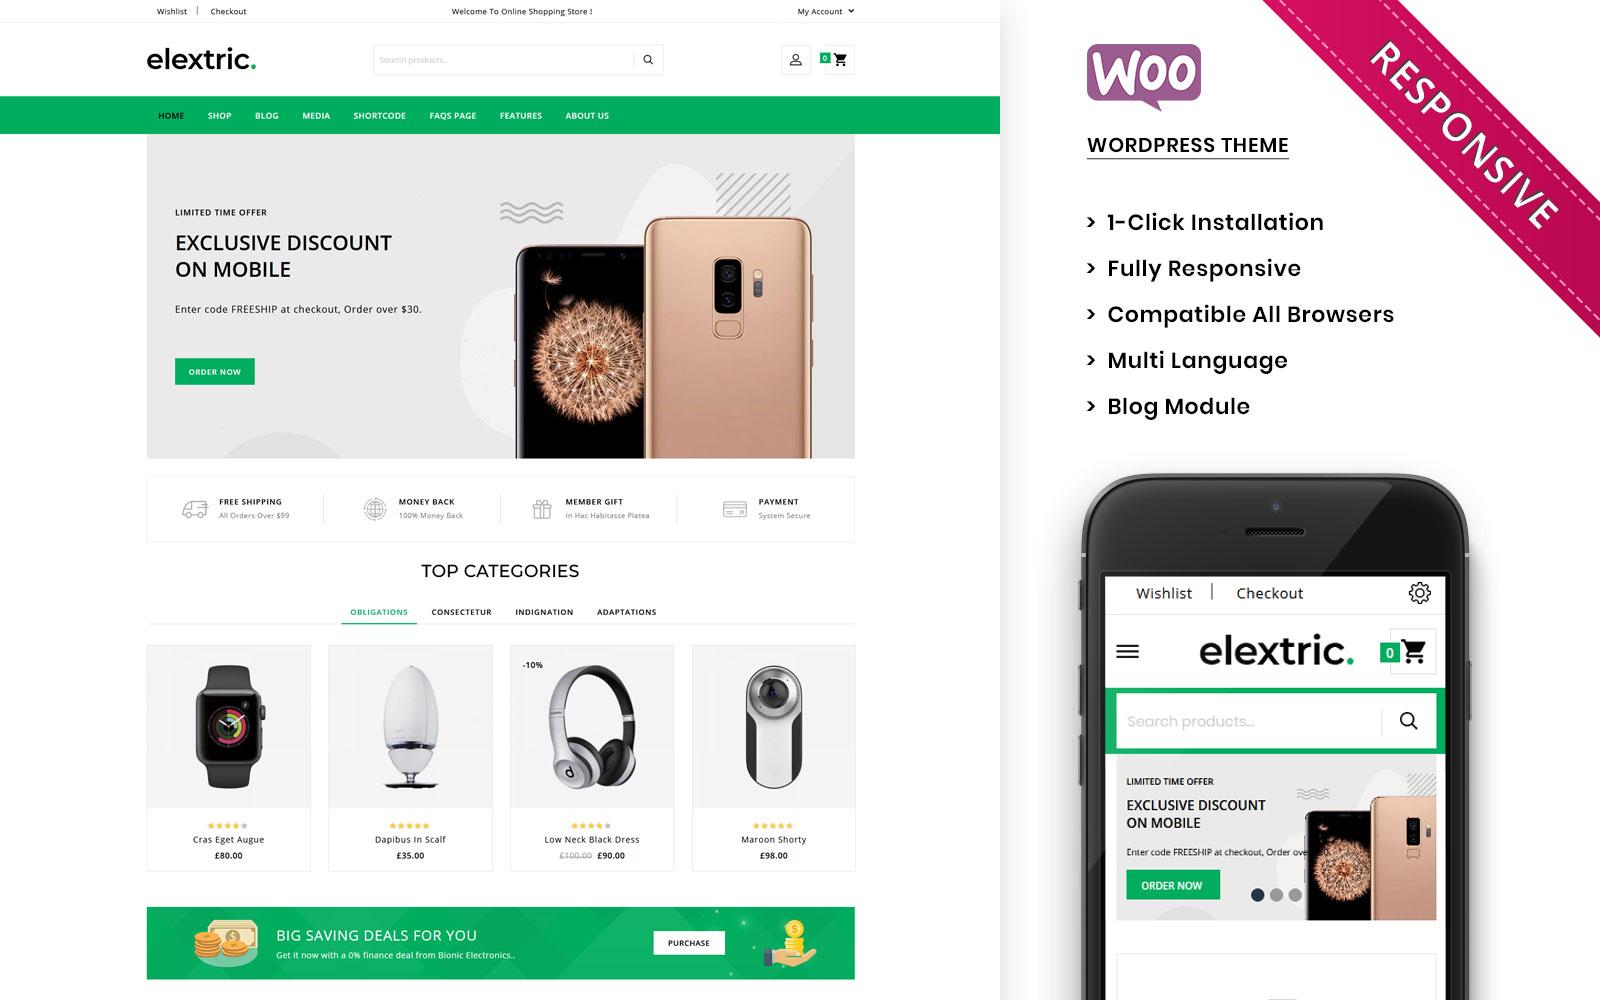 Elextric - The Premium Electronic Store WooCommerce Theme